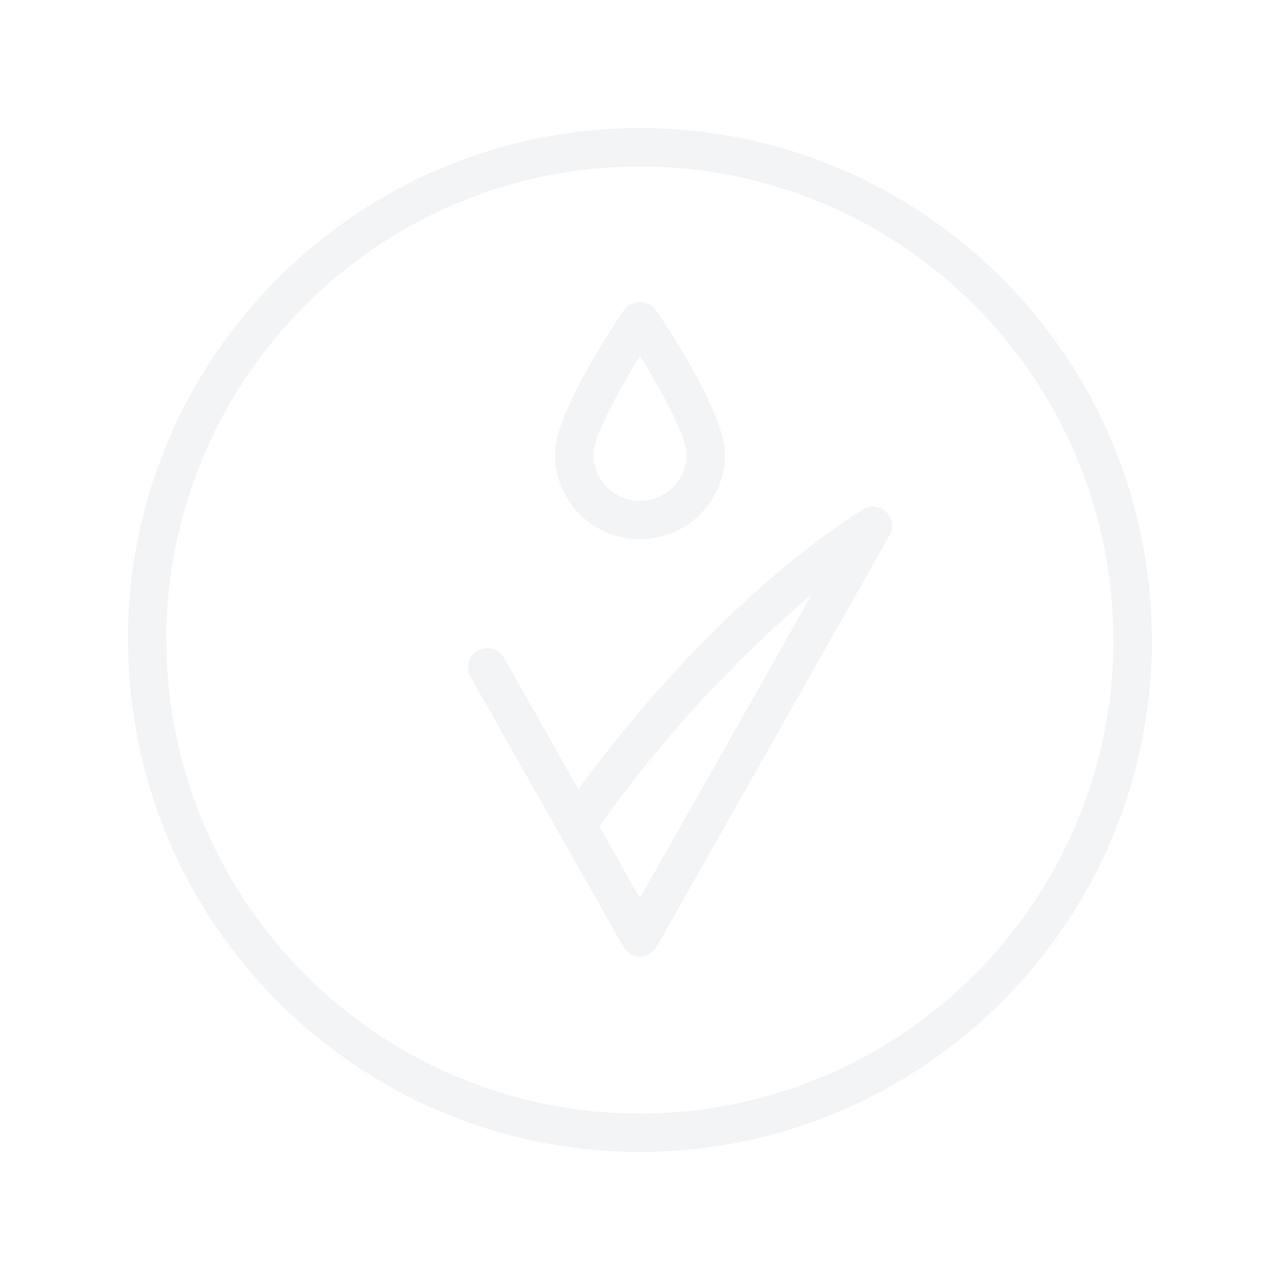 MINIGOLD Lovemark Chic Necklace